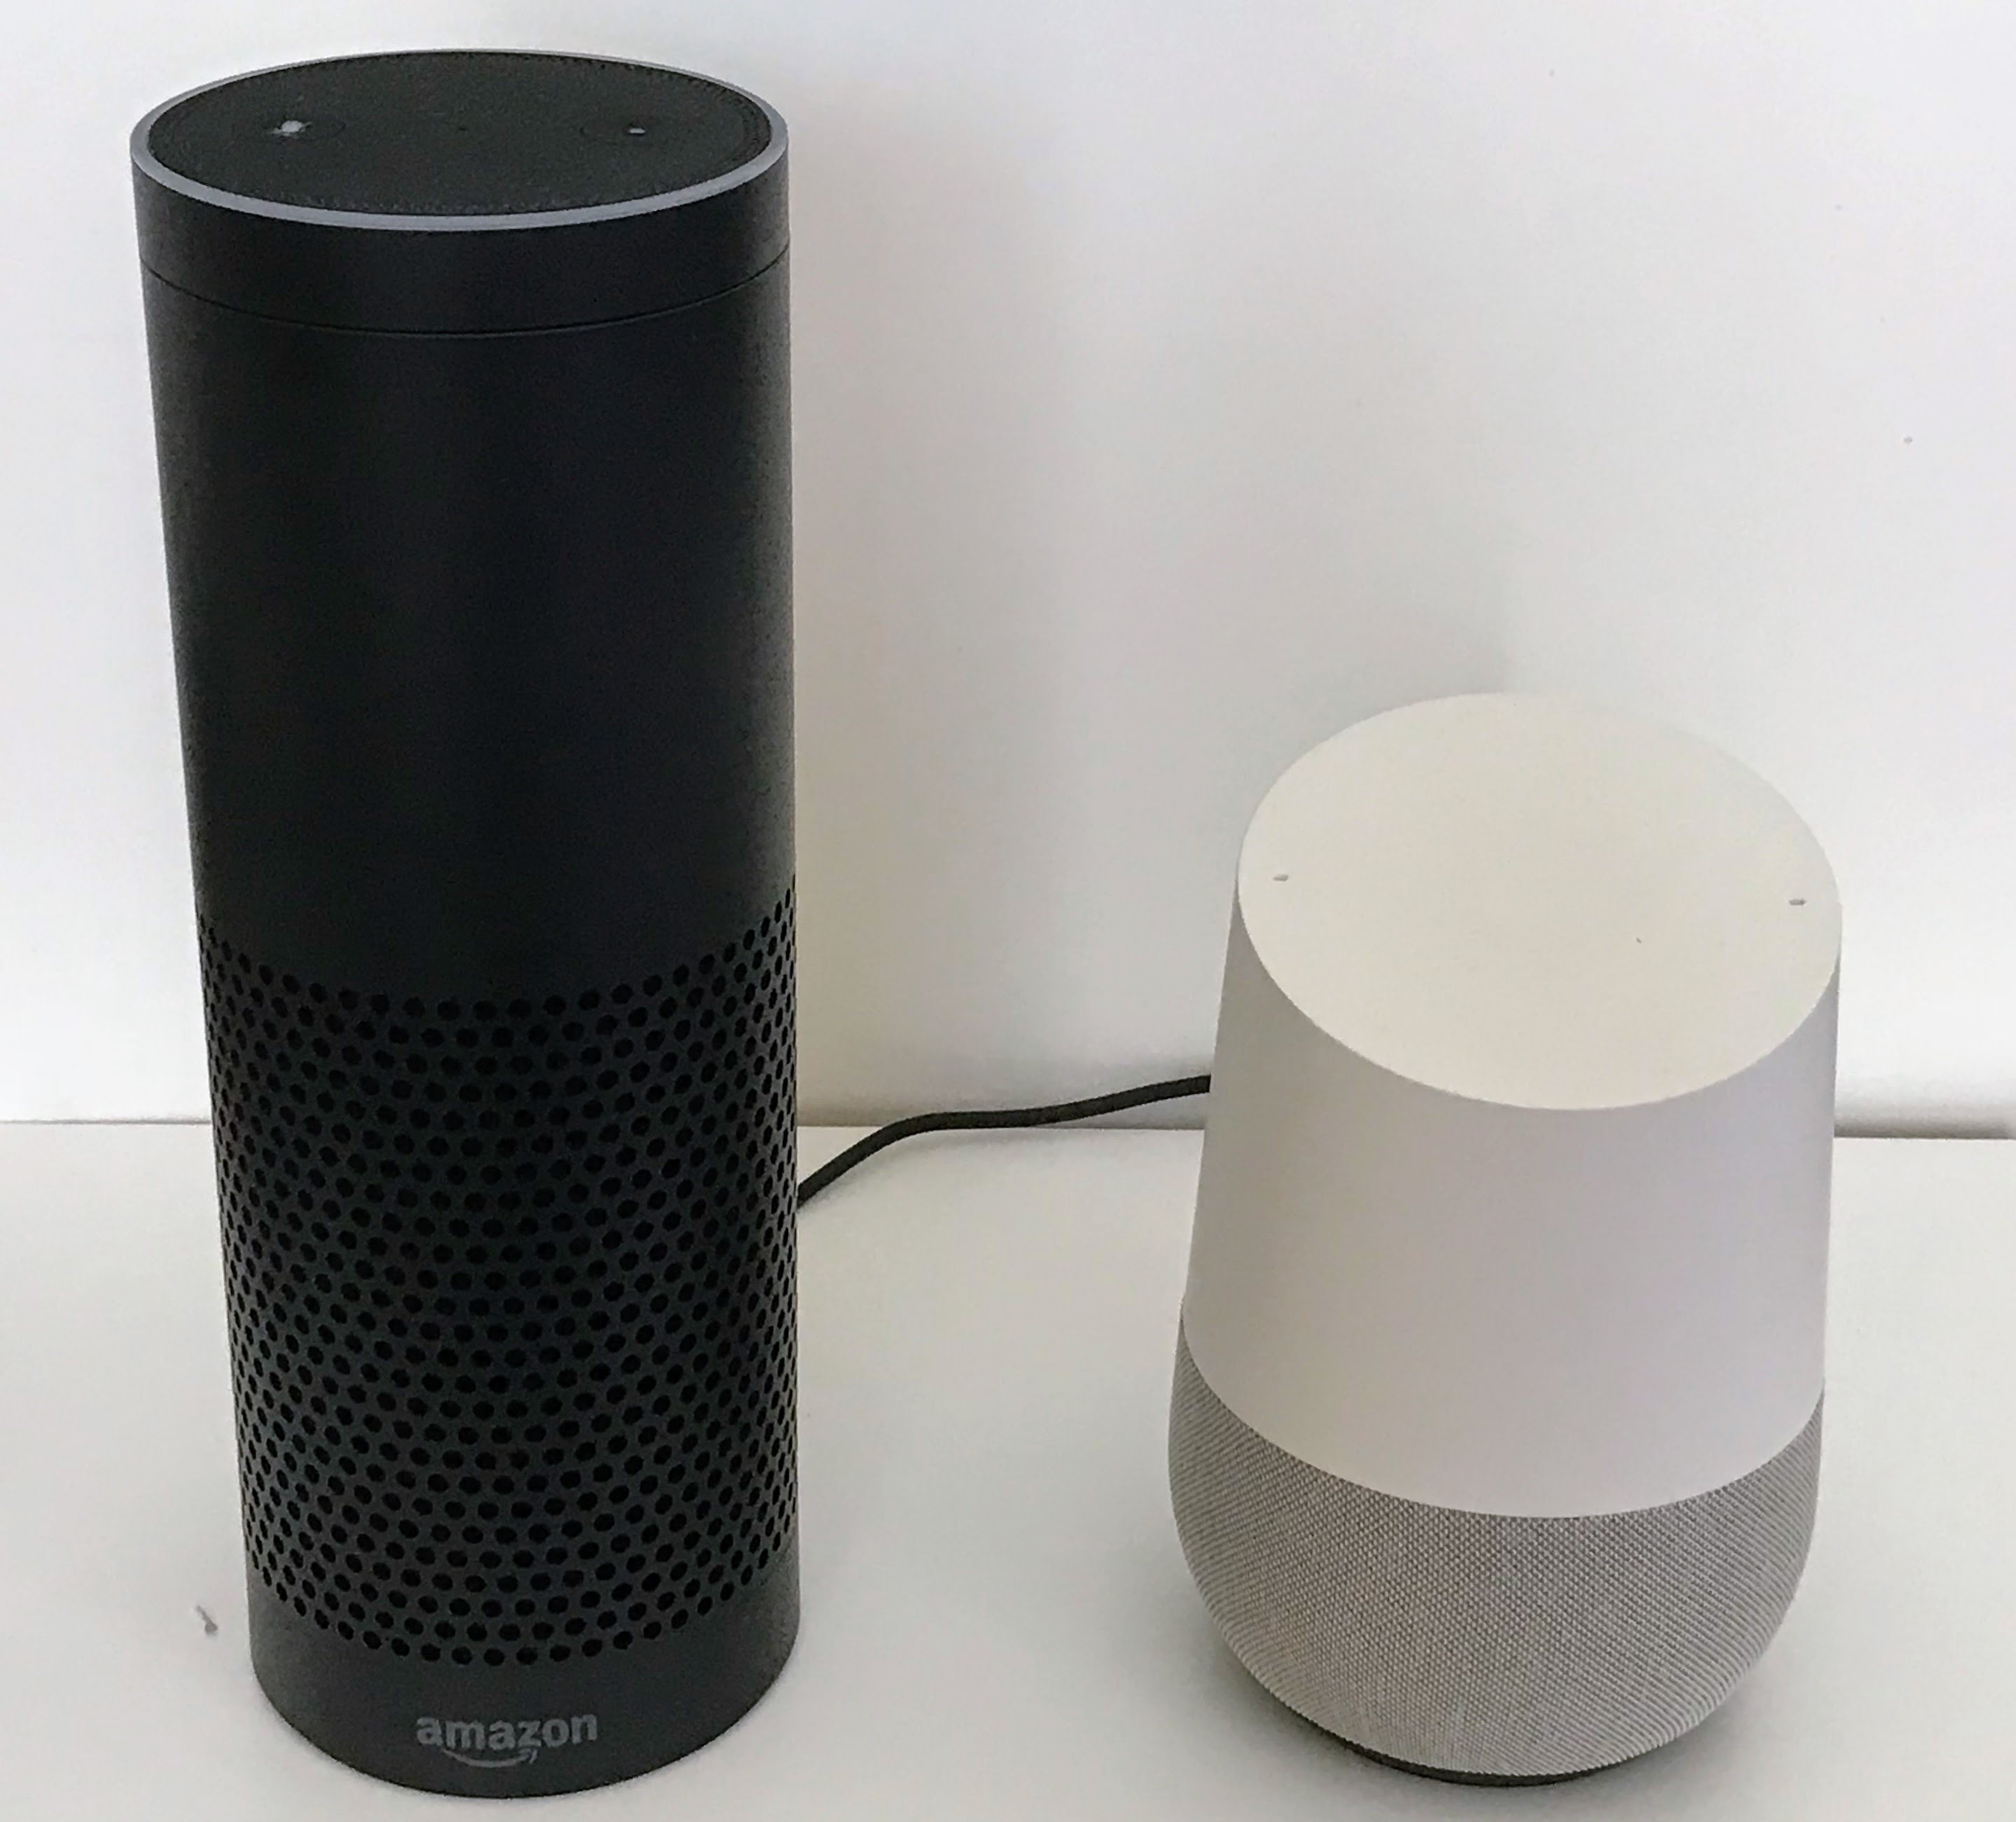 Smart Attack: Tool Lets Smart Speakers Detect Cardiac Arrest